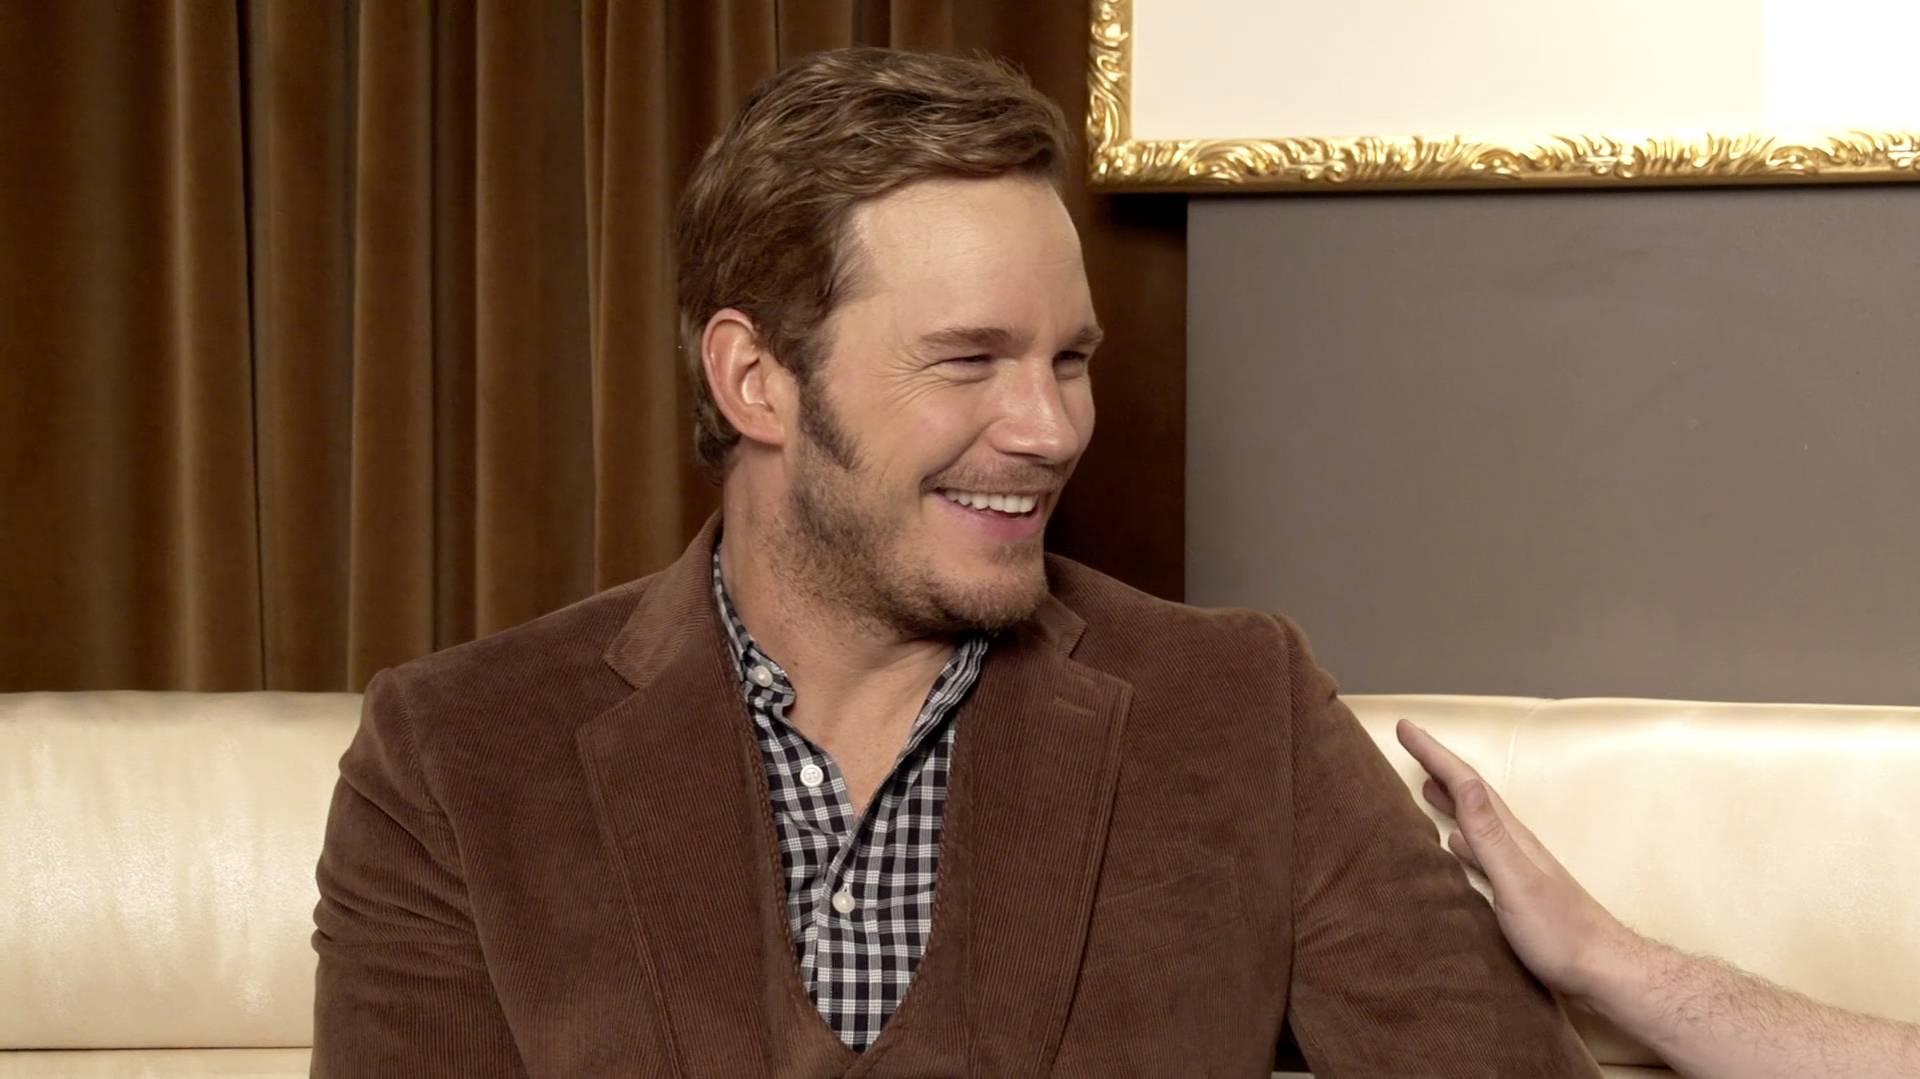 Chris Pratt on His Many Blockbusters at CinemaCon